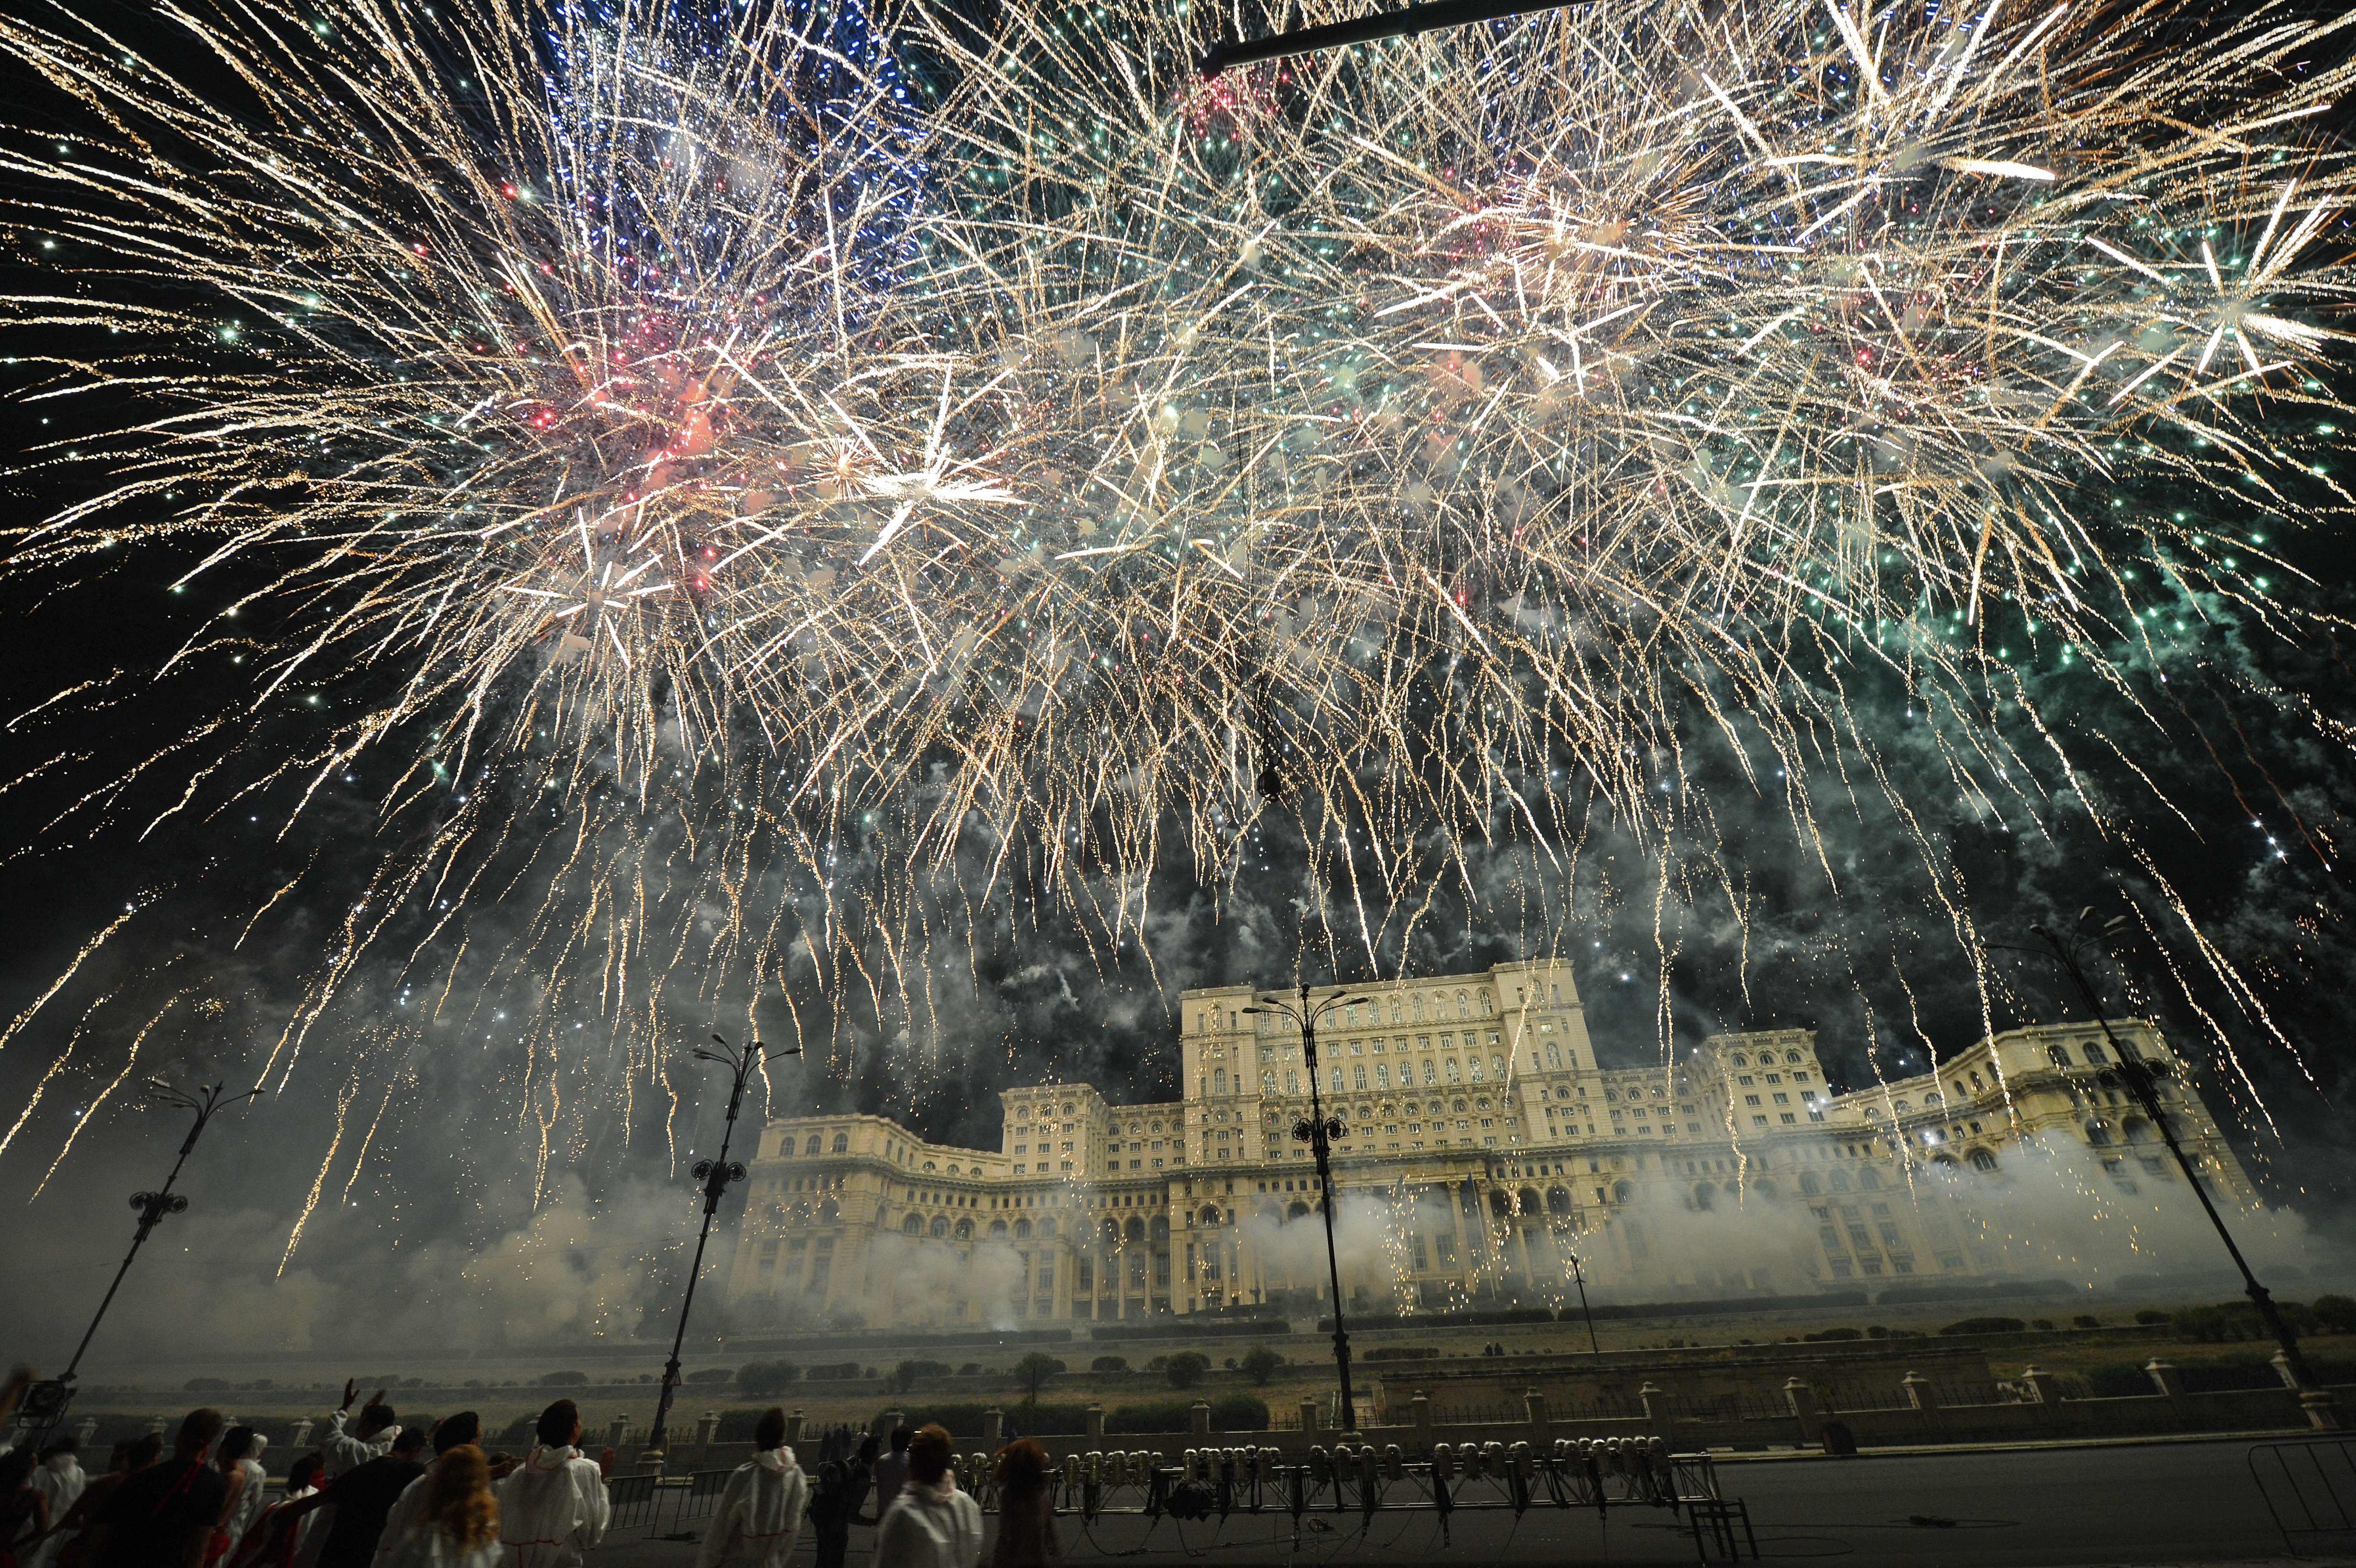 Fireworks illuminating the Romanian Parliament building